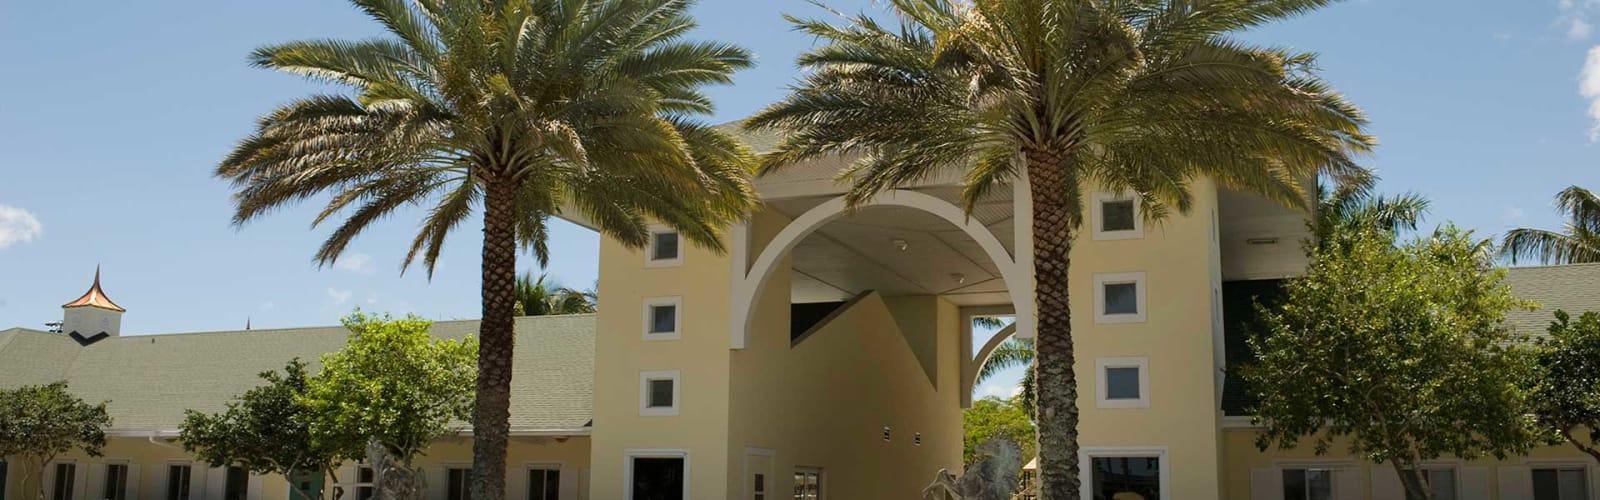 Private School In South Florida   PreK - 12   American